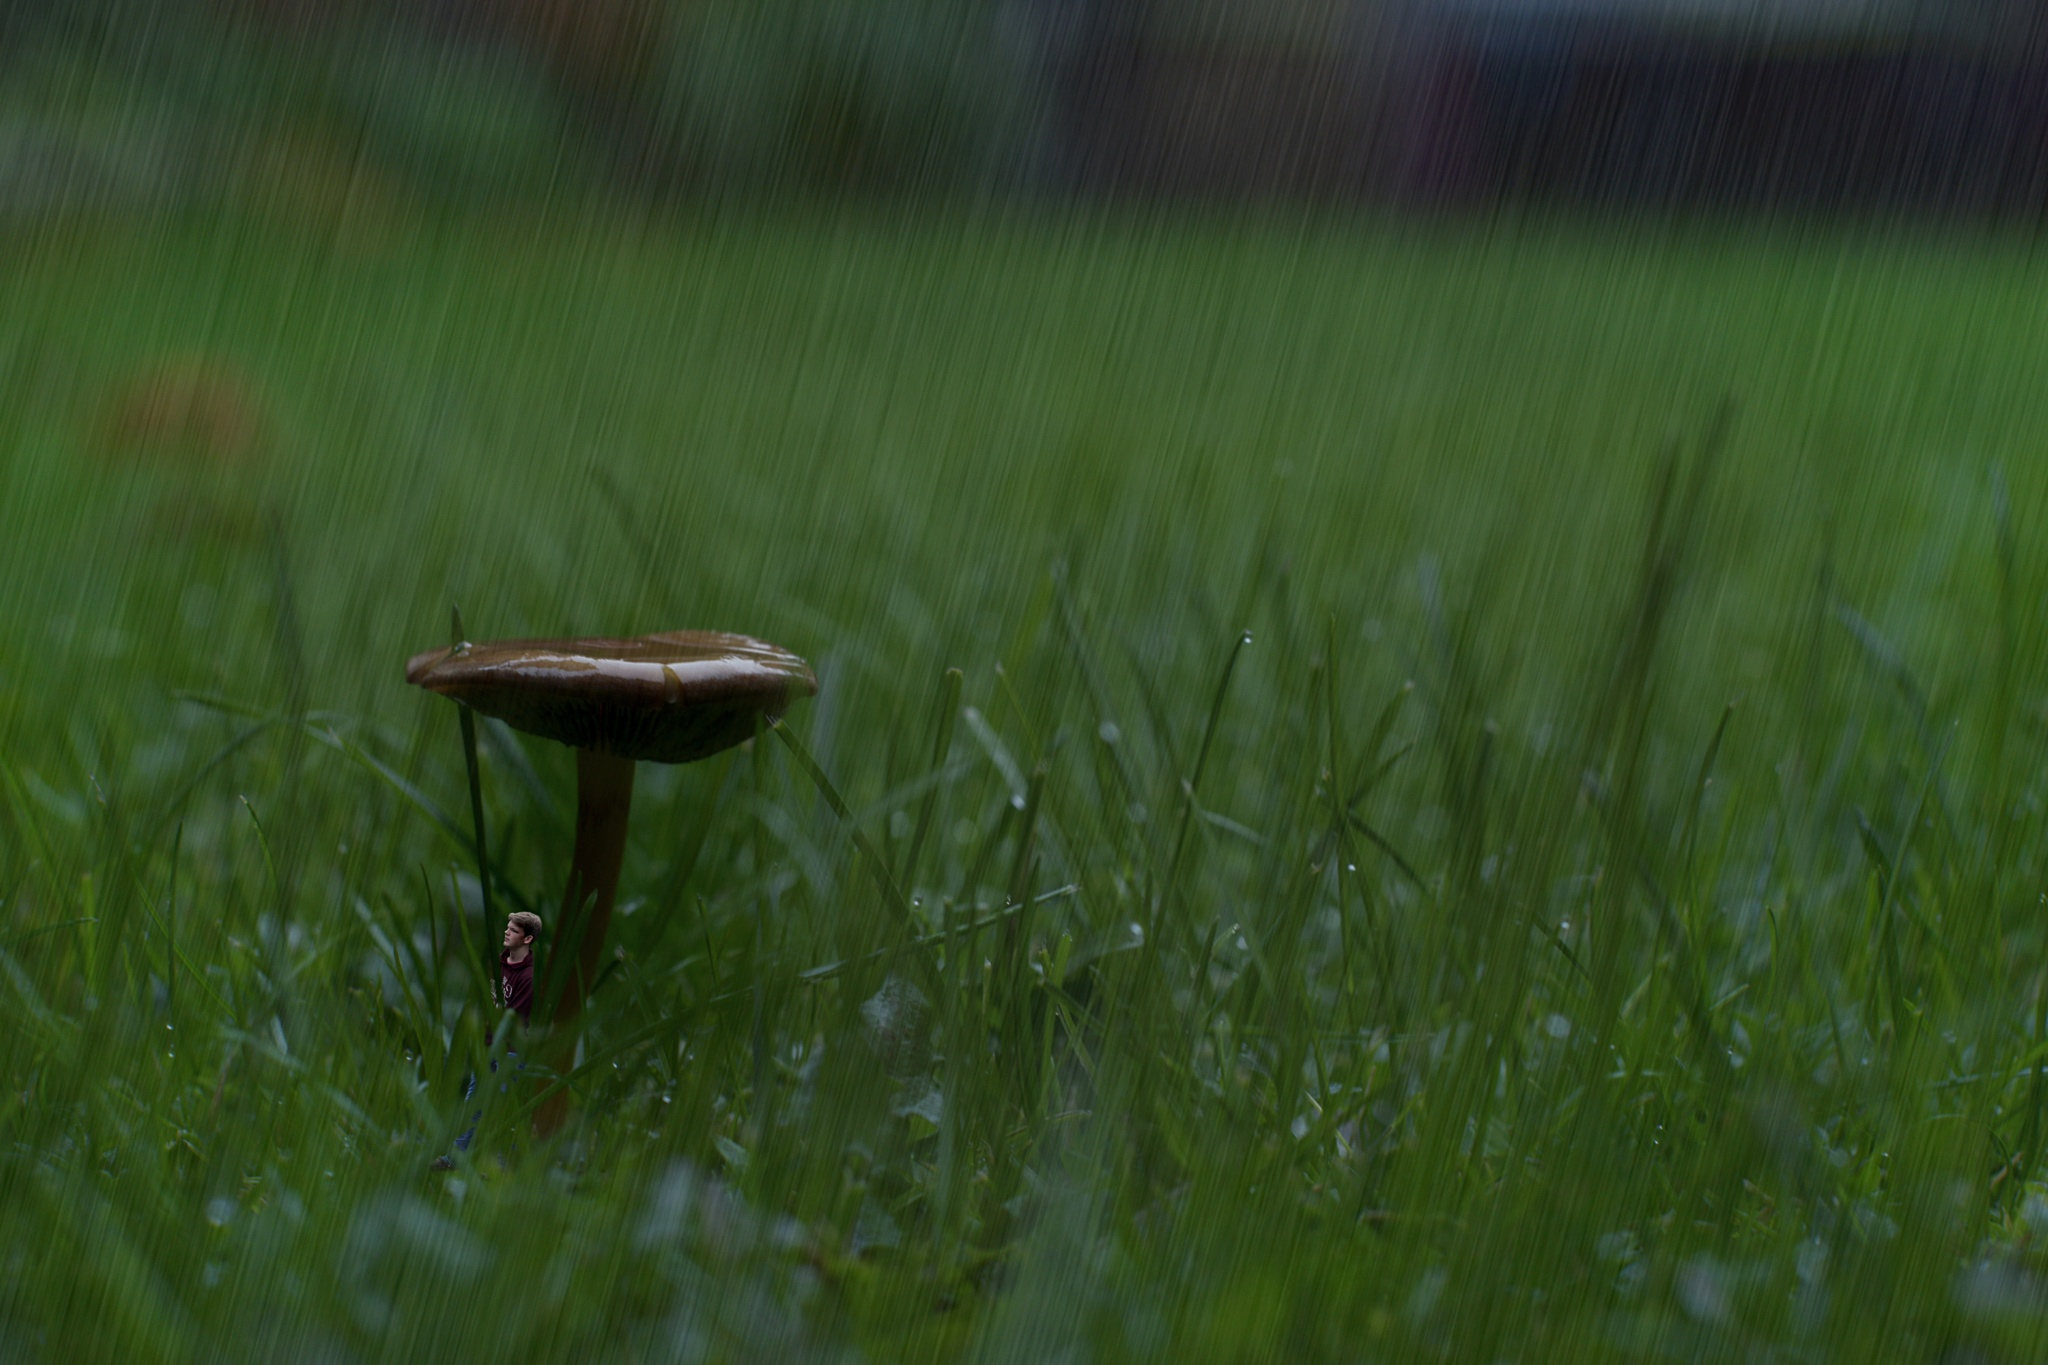 Rain mushroom by LouisBlawert